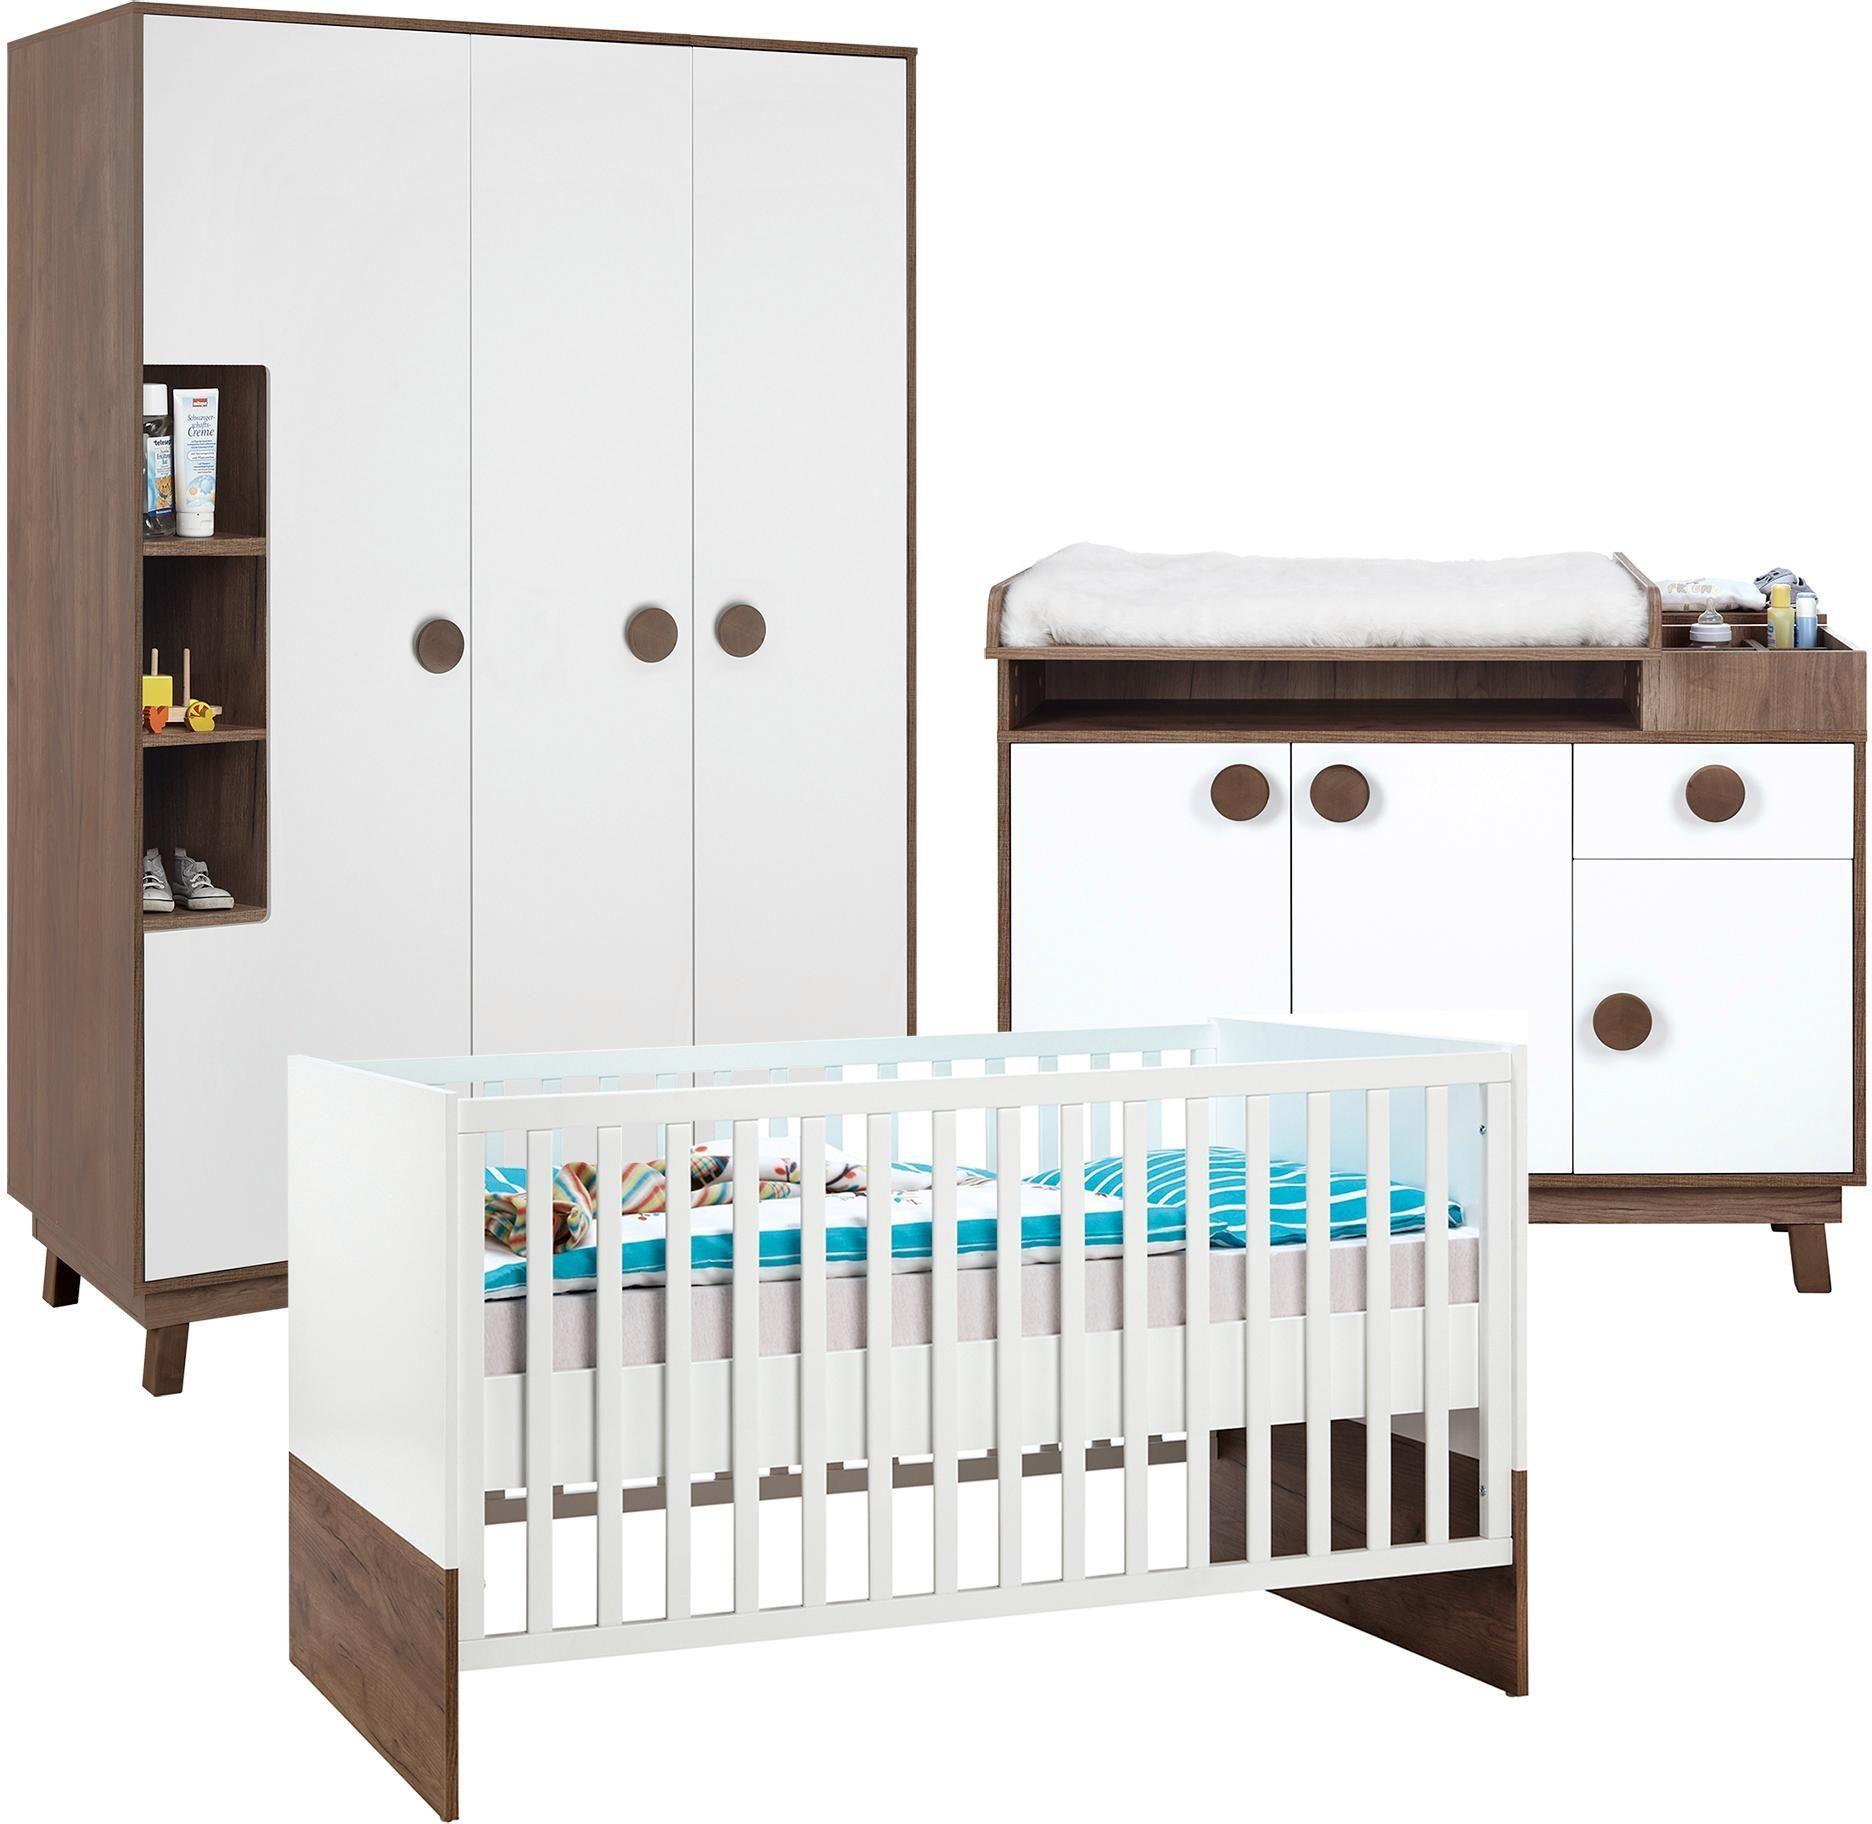 Roba Babyzimmer Set (3-tlg.), Kinderzimmer, »Nordic Star, 3-türig«